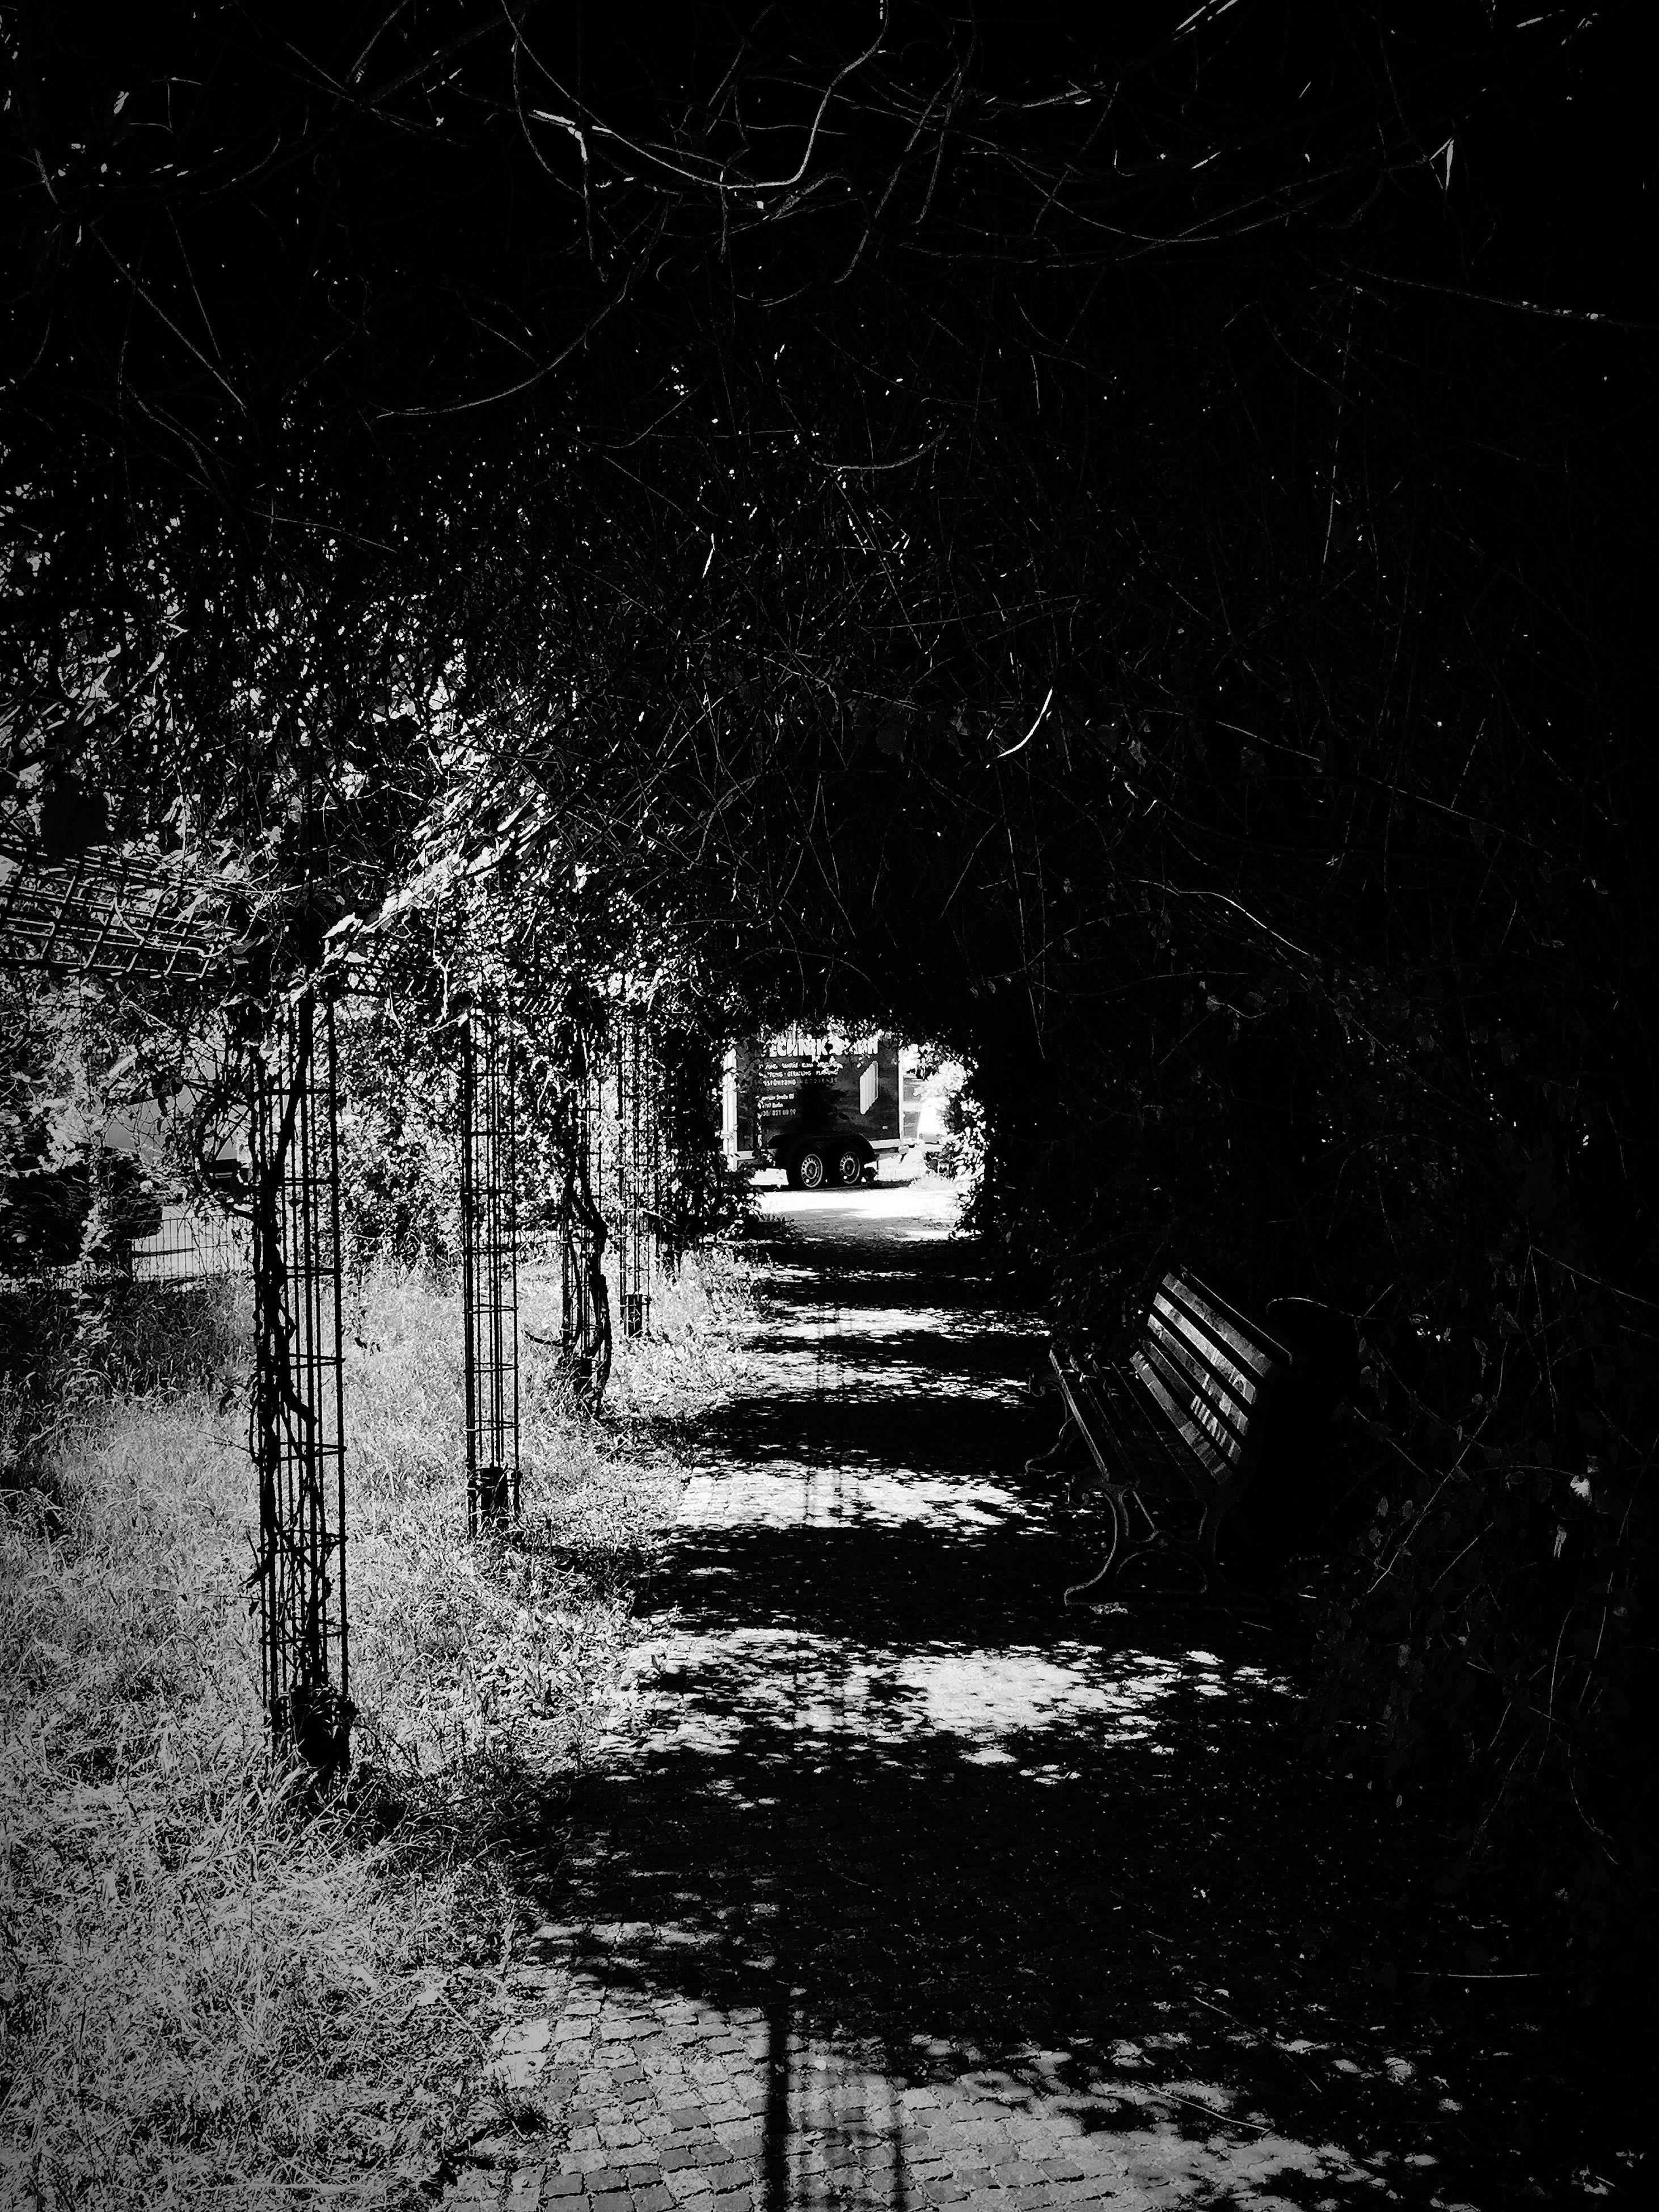 night, the way forward, illuminated, diminishing perspective, tree, dark, street light, built structure, vanishing point, architecture, walkway, street, steps, footpath, pathway, outdoors, empty, narrow, long, lighting equipment